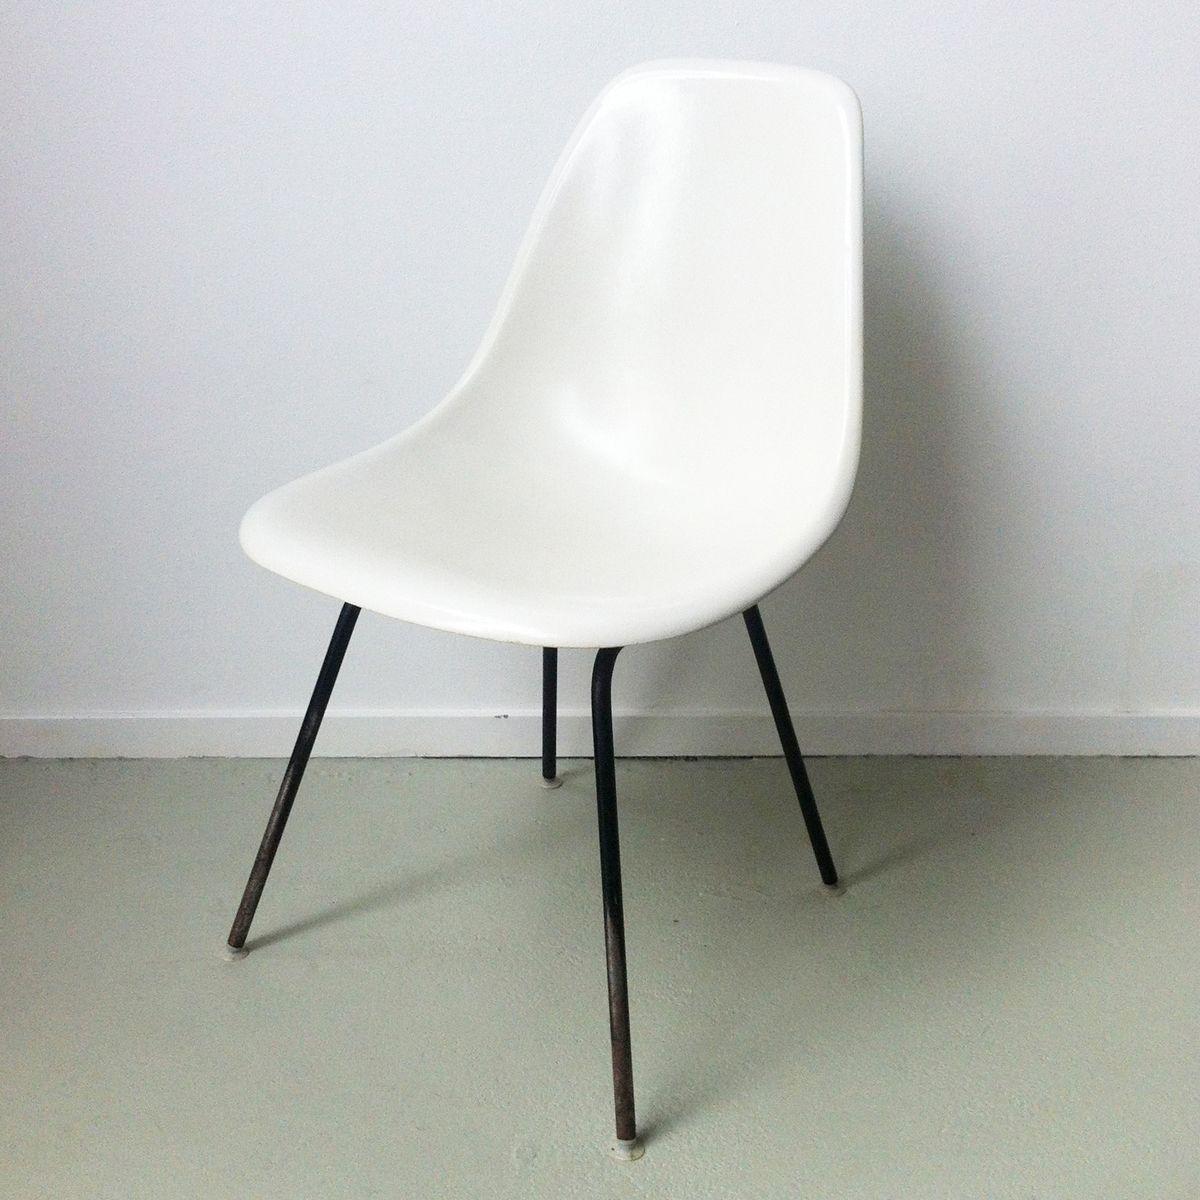 dsx stuhl von charles ray eames f r herman miller bei pamono kaufen. Black Bedroom Furniture Sets. Home Design Ideas